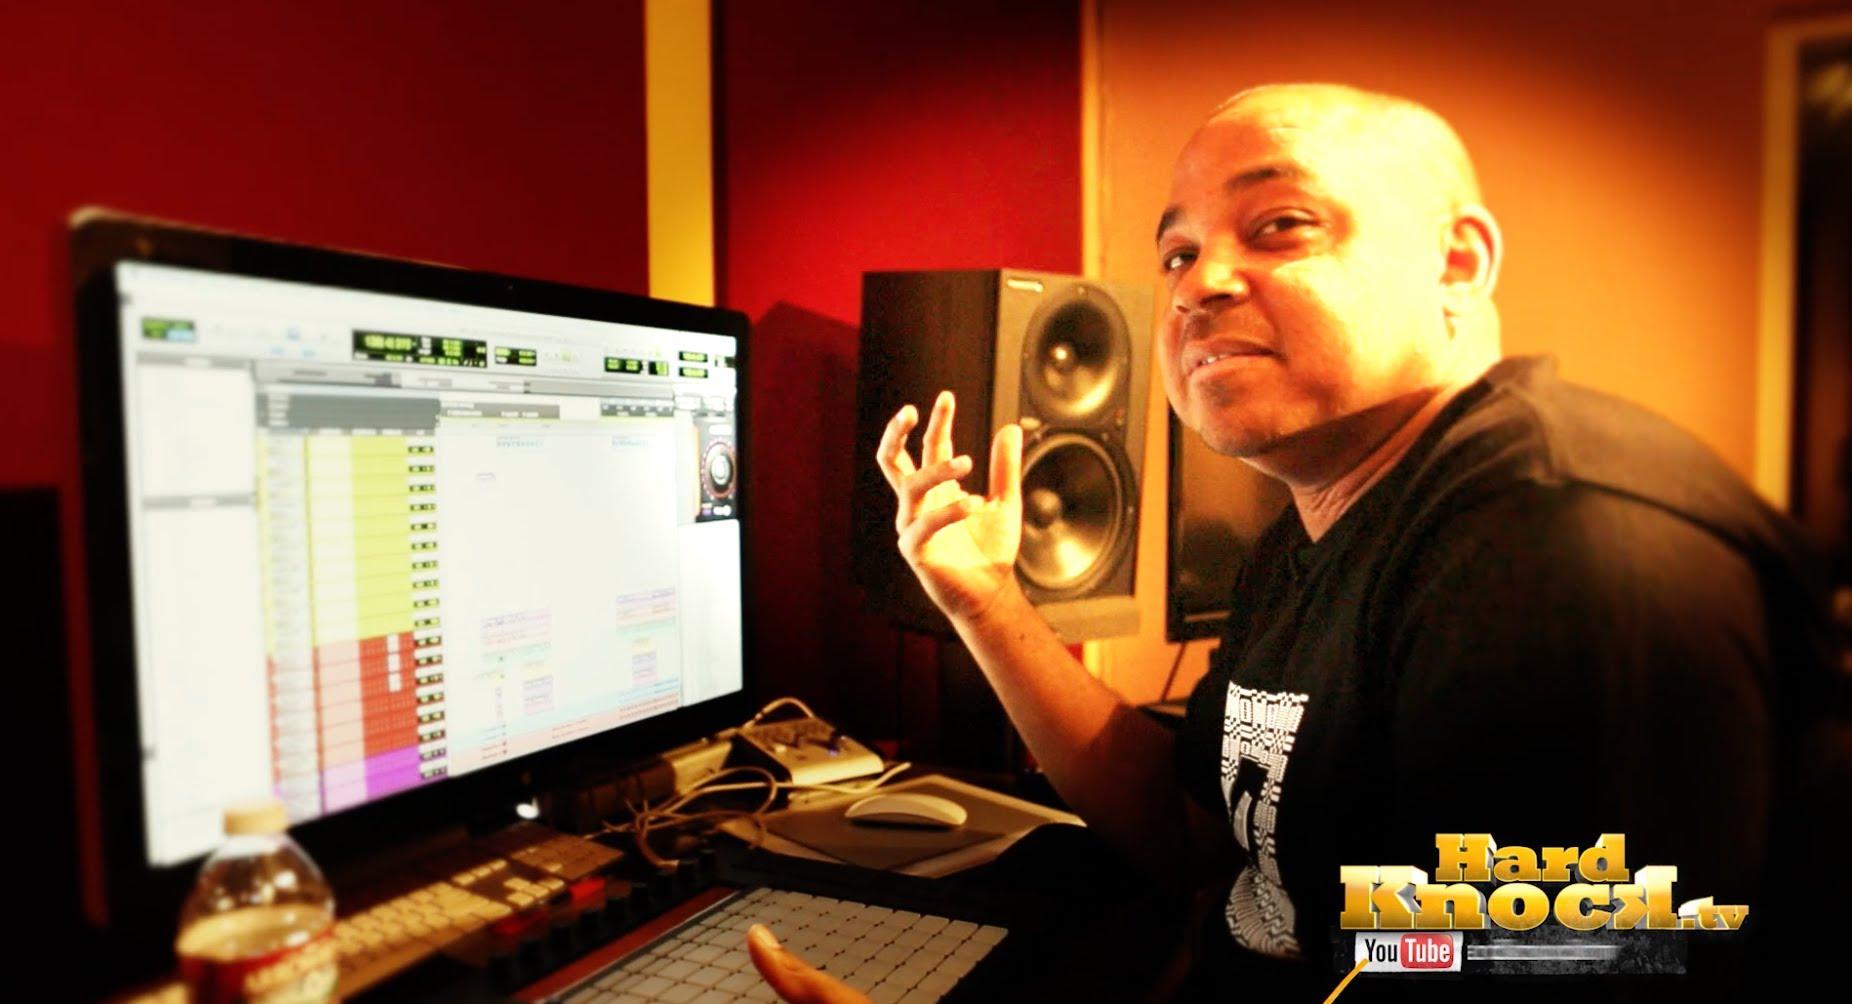 DJ Khalil Says Music Needs More Joy After EDM, Dark Cycle interview by Nick Huff Barili hard knock tv